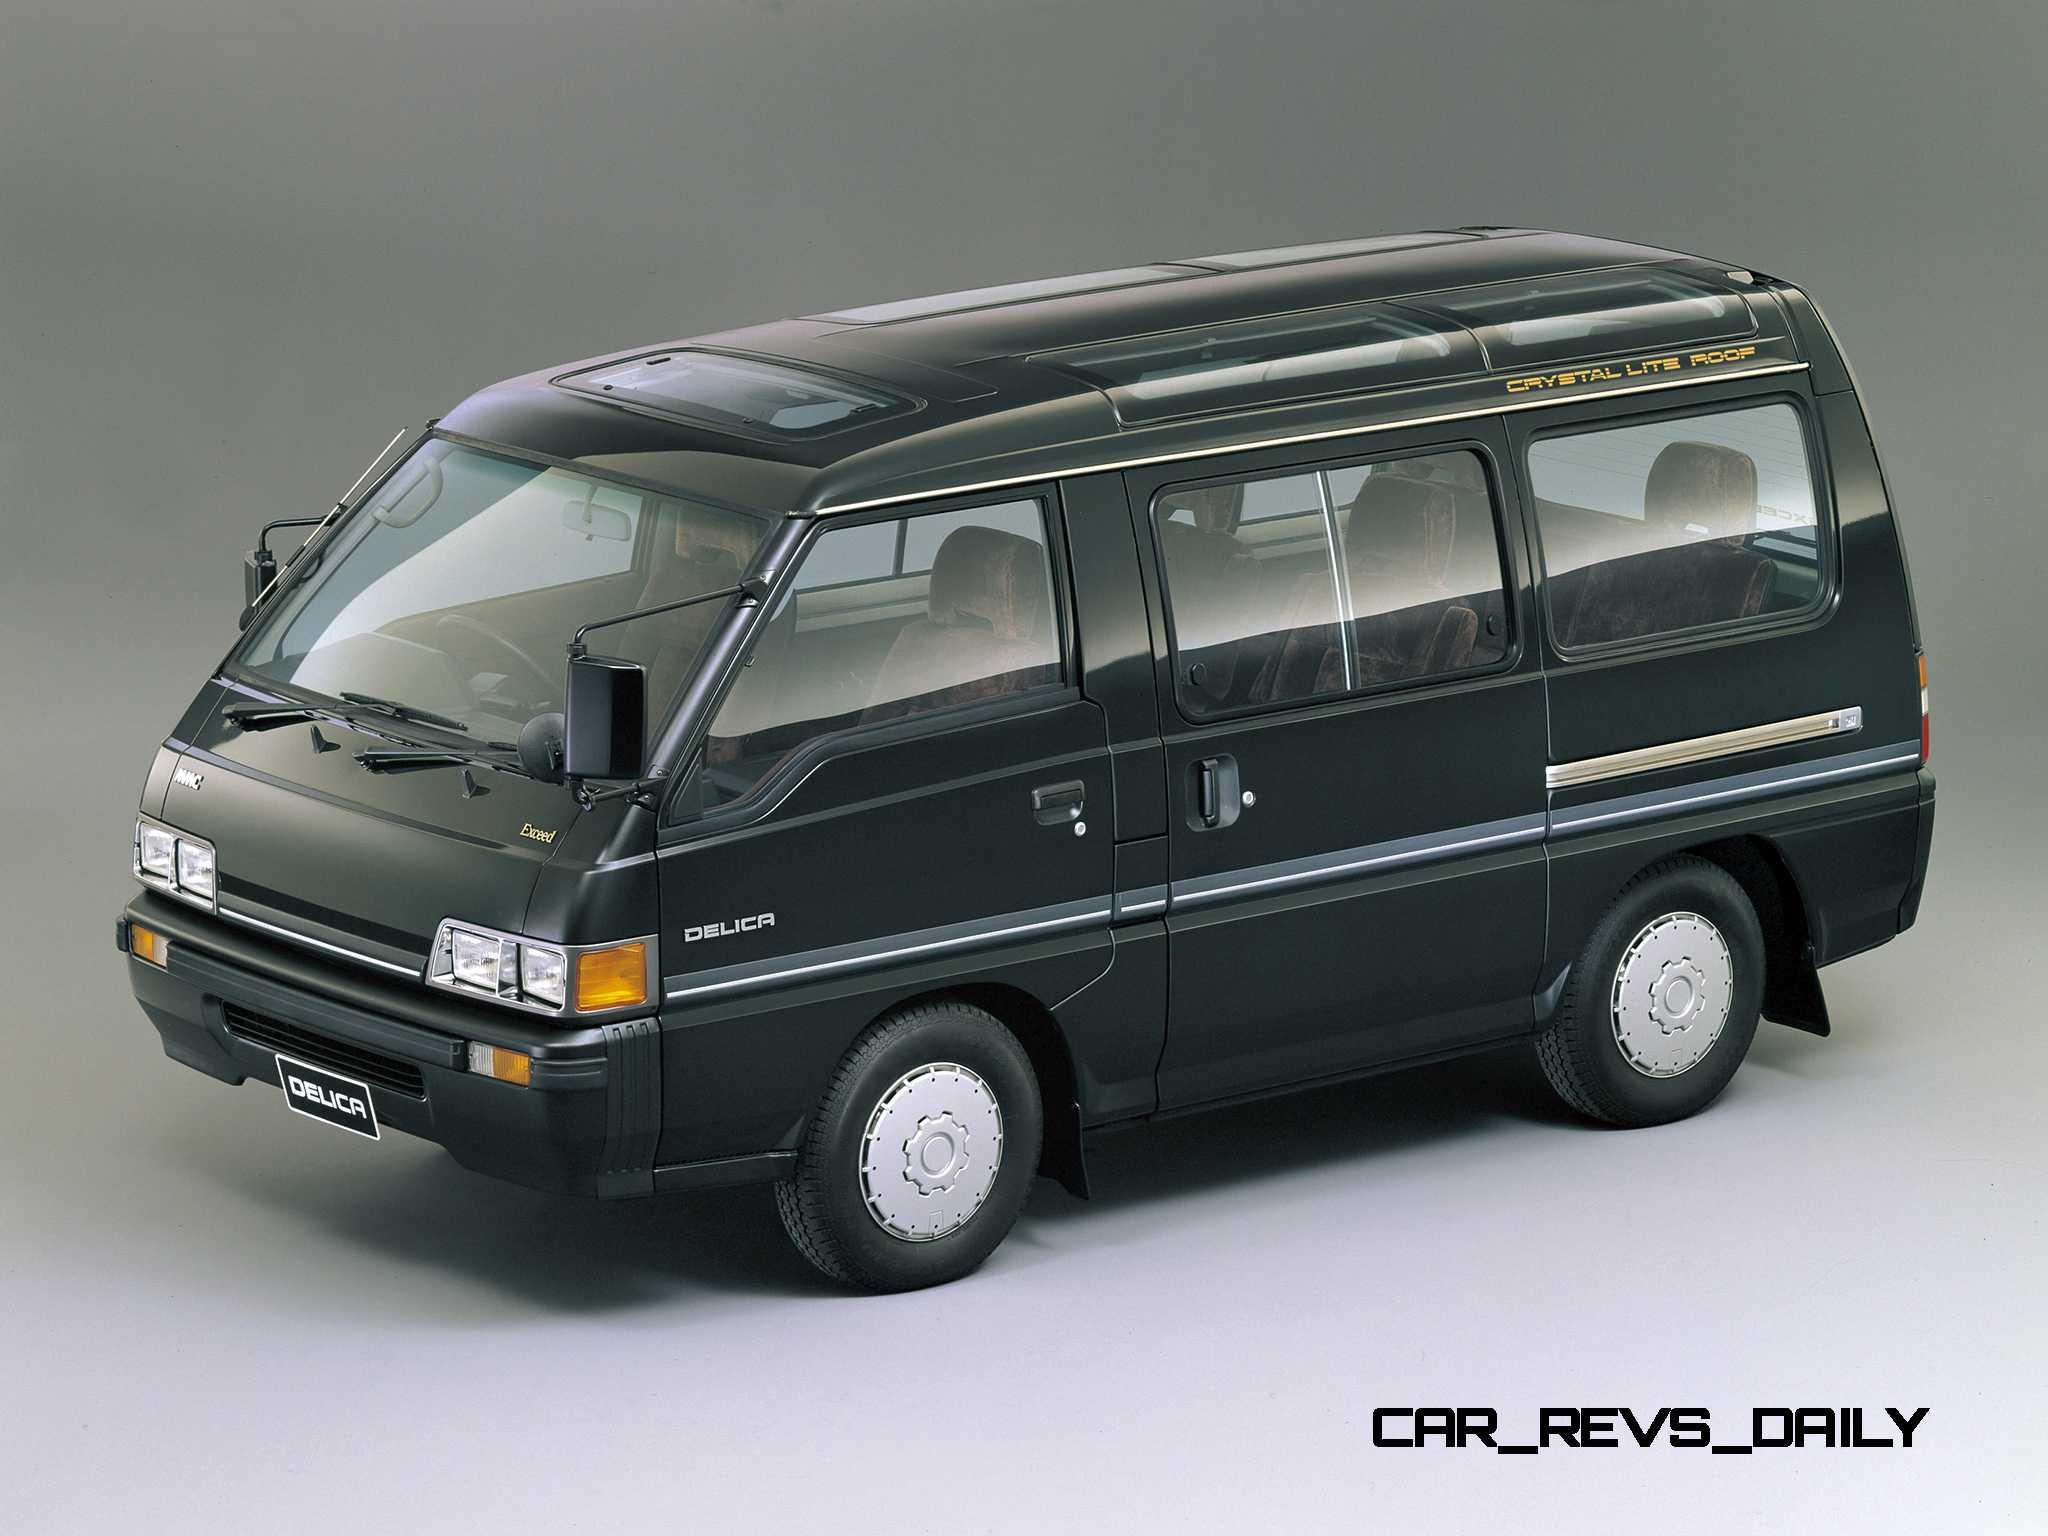 http://www.car-revs-daily.com/wp-content/uploads/2014/12/Concept-Debrief-2006-Mitsubishi-D5-Was-Future-Style-Cool-Van-13.jpg